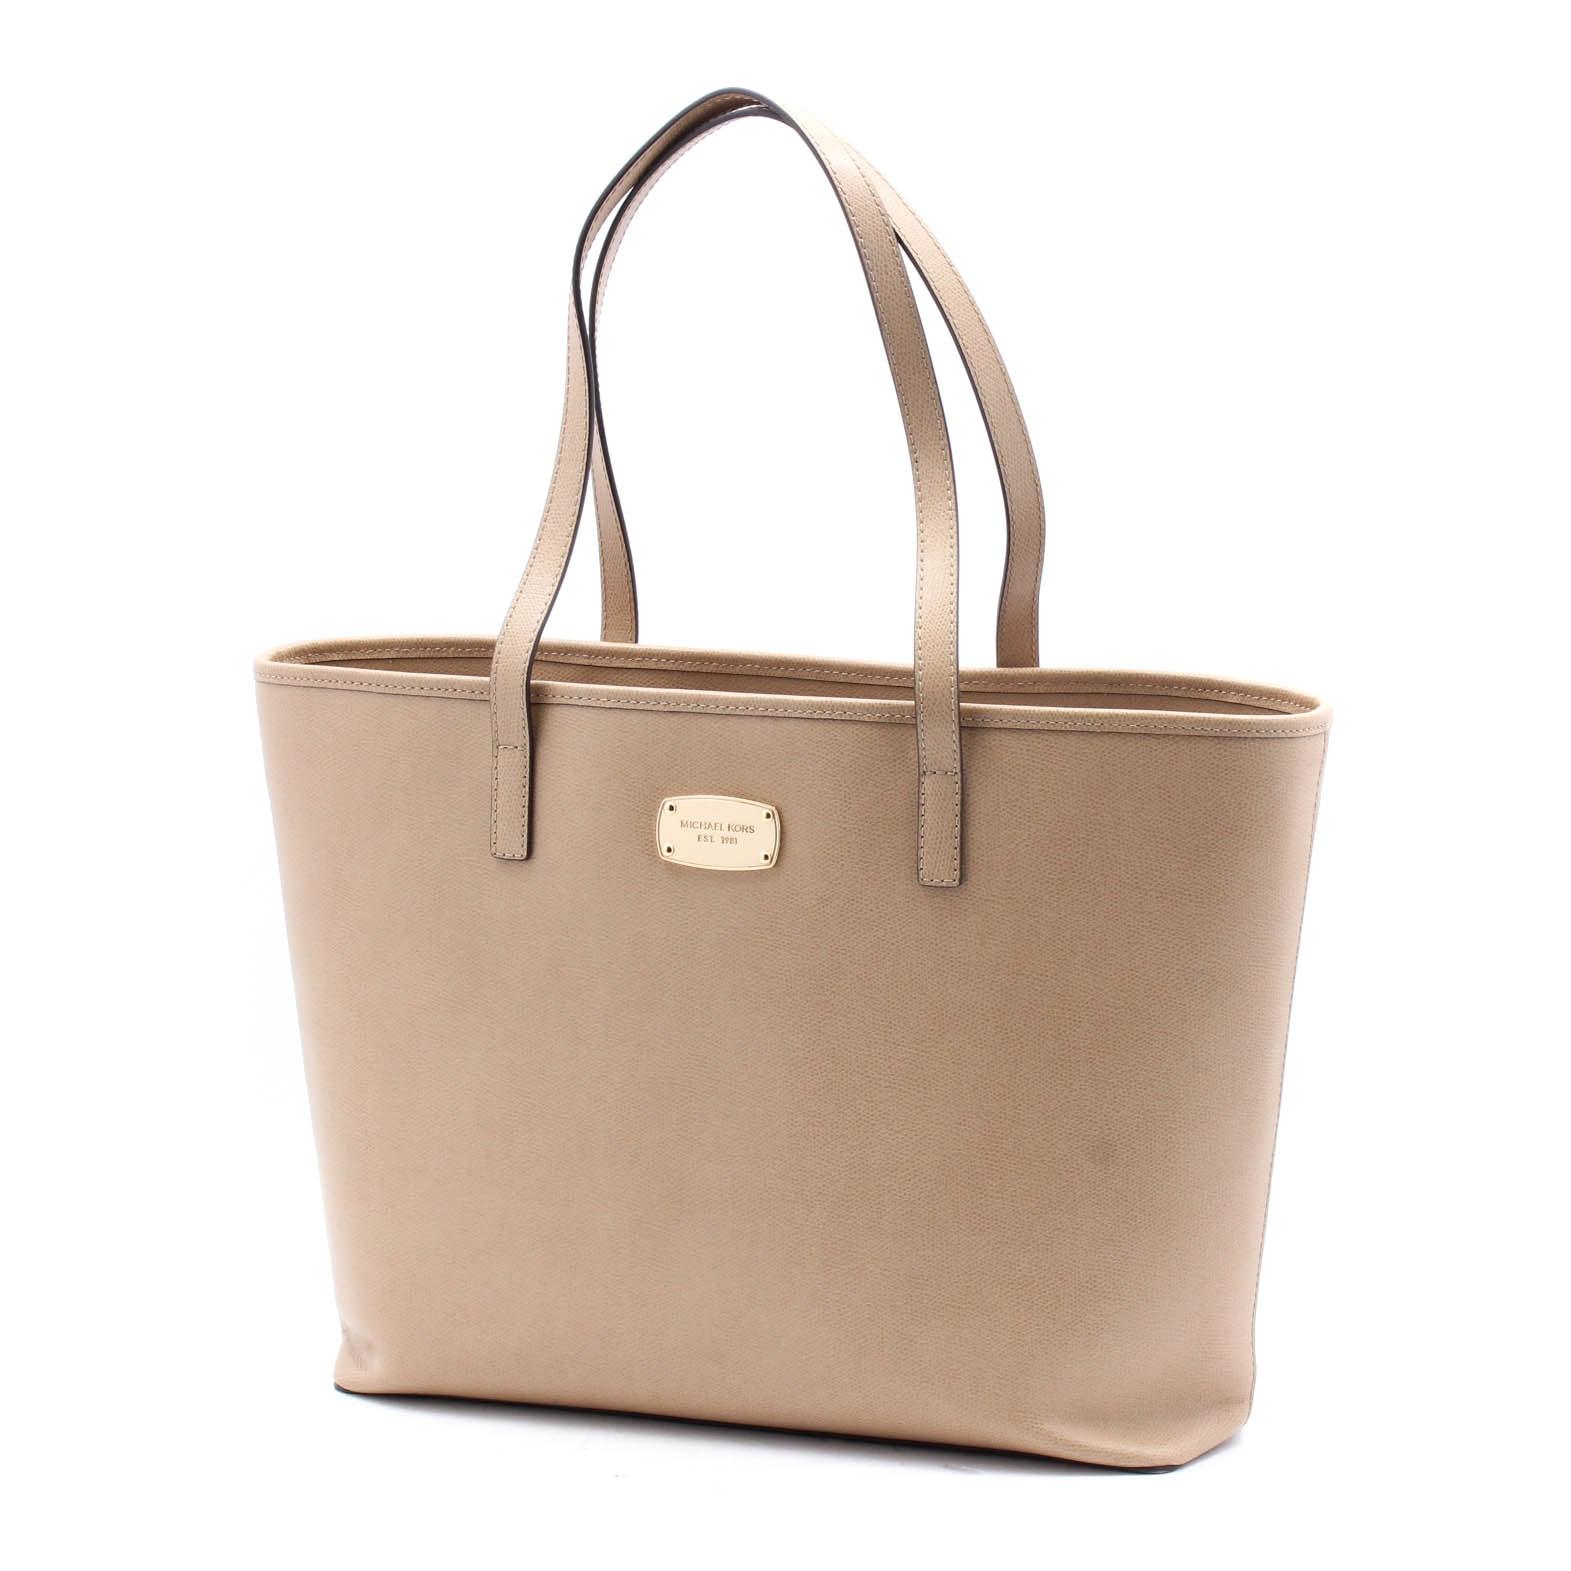 MICHAEL Michael Kors Nude Leather Tote Bag